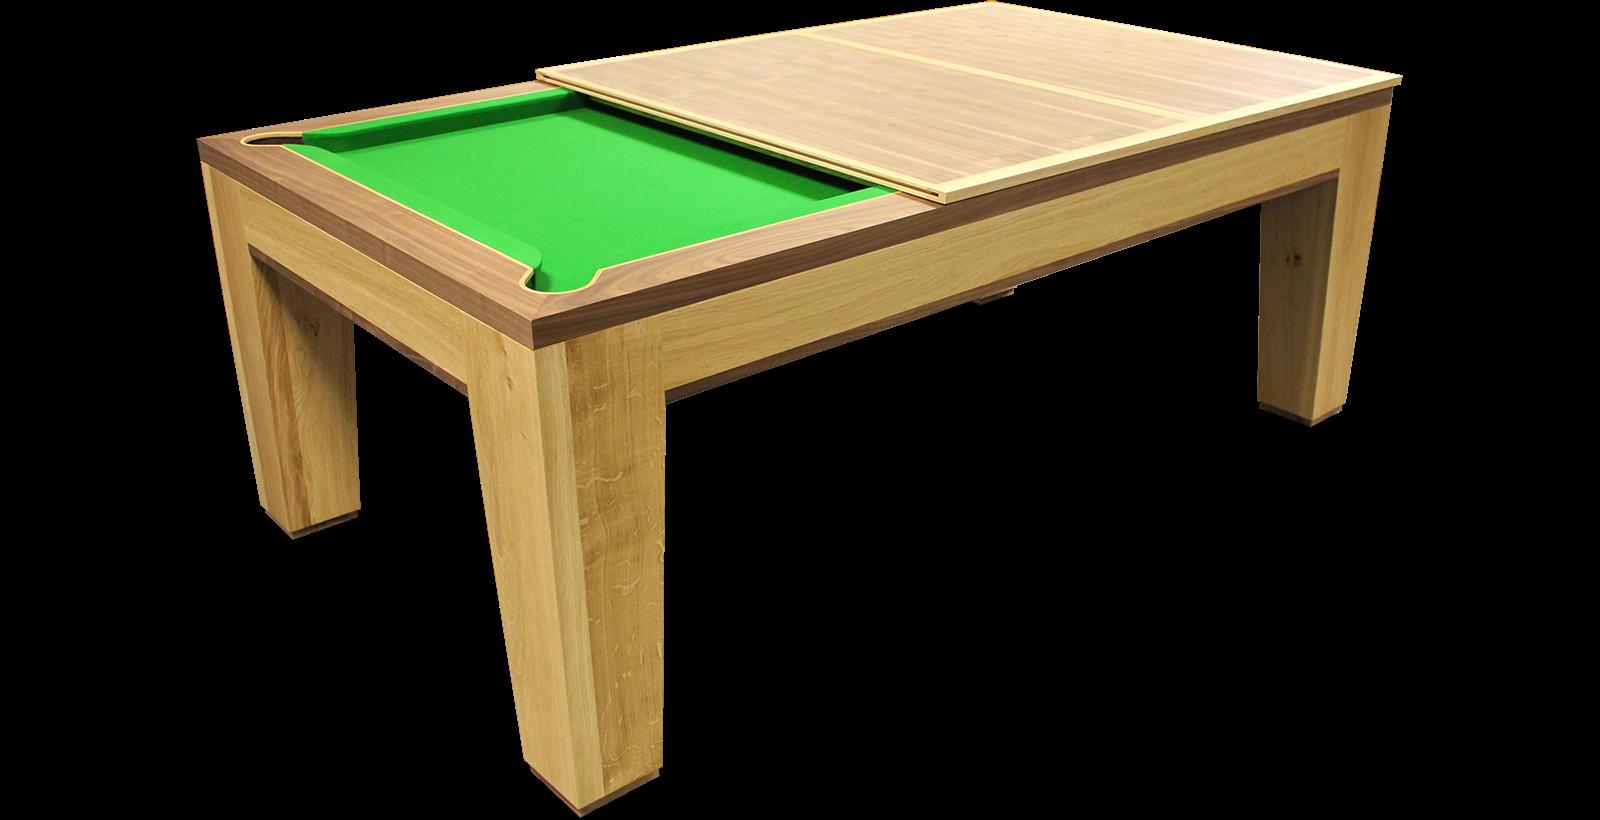 Pool Table Designers Amp Manufactures In Wiltshire Designer